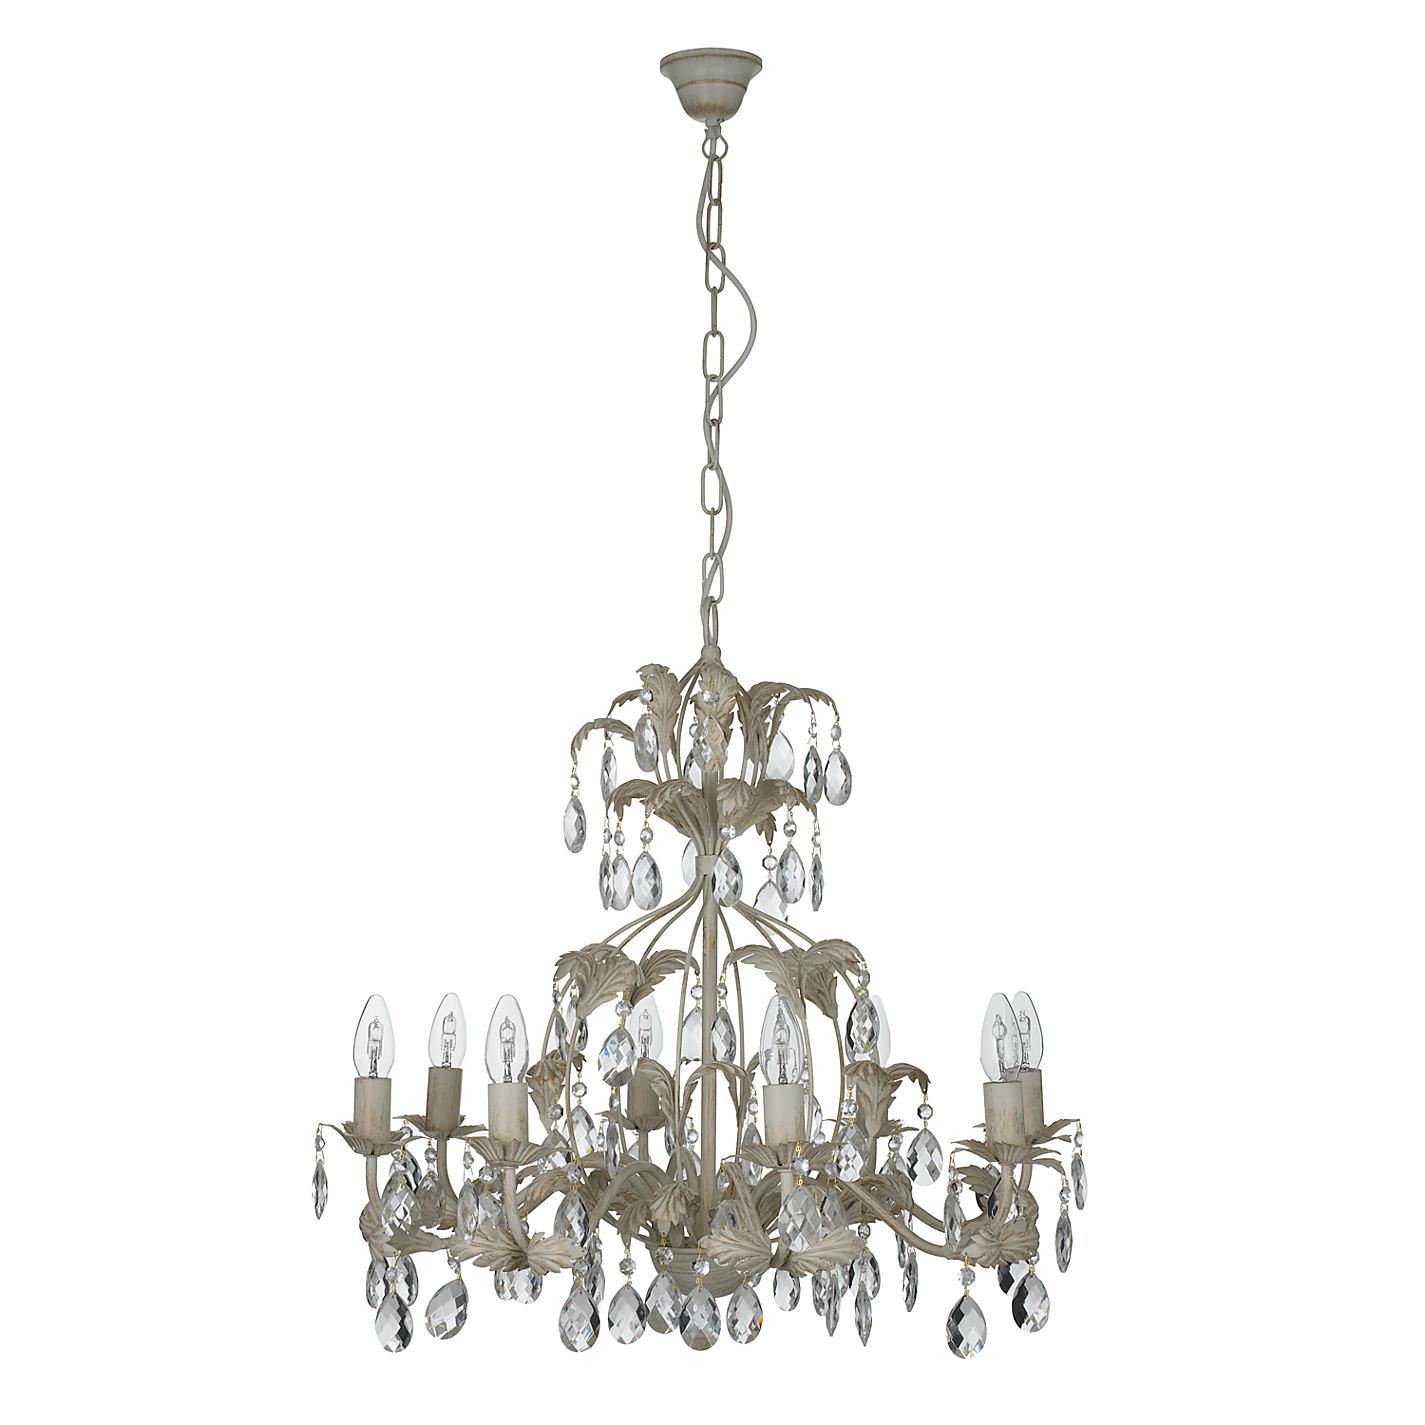 Mesmerizing 25 bathroom chandeliers john lewis design inspiration bathroom chandeliers john lewis buy john lewis annabella chandelier 8 arm john lewis arubaitofo Gallery